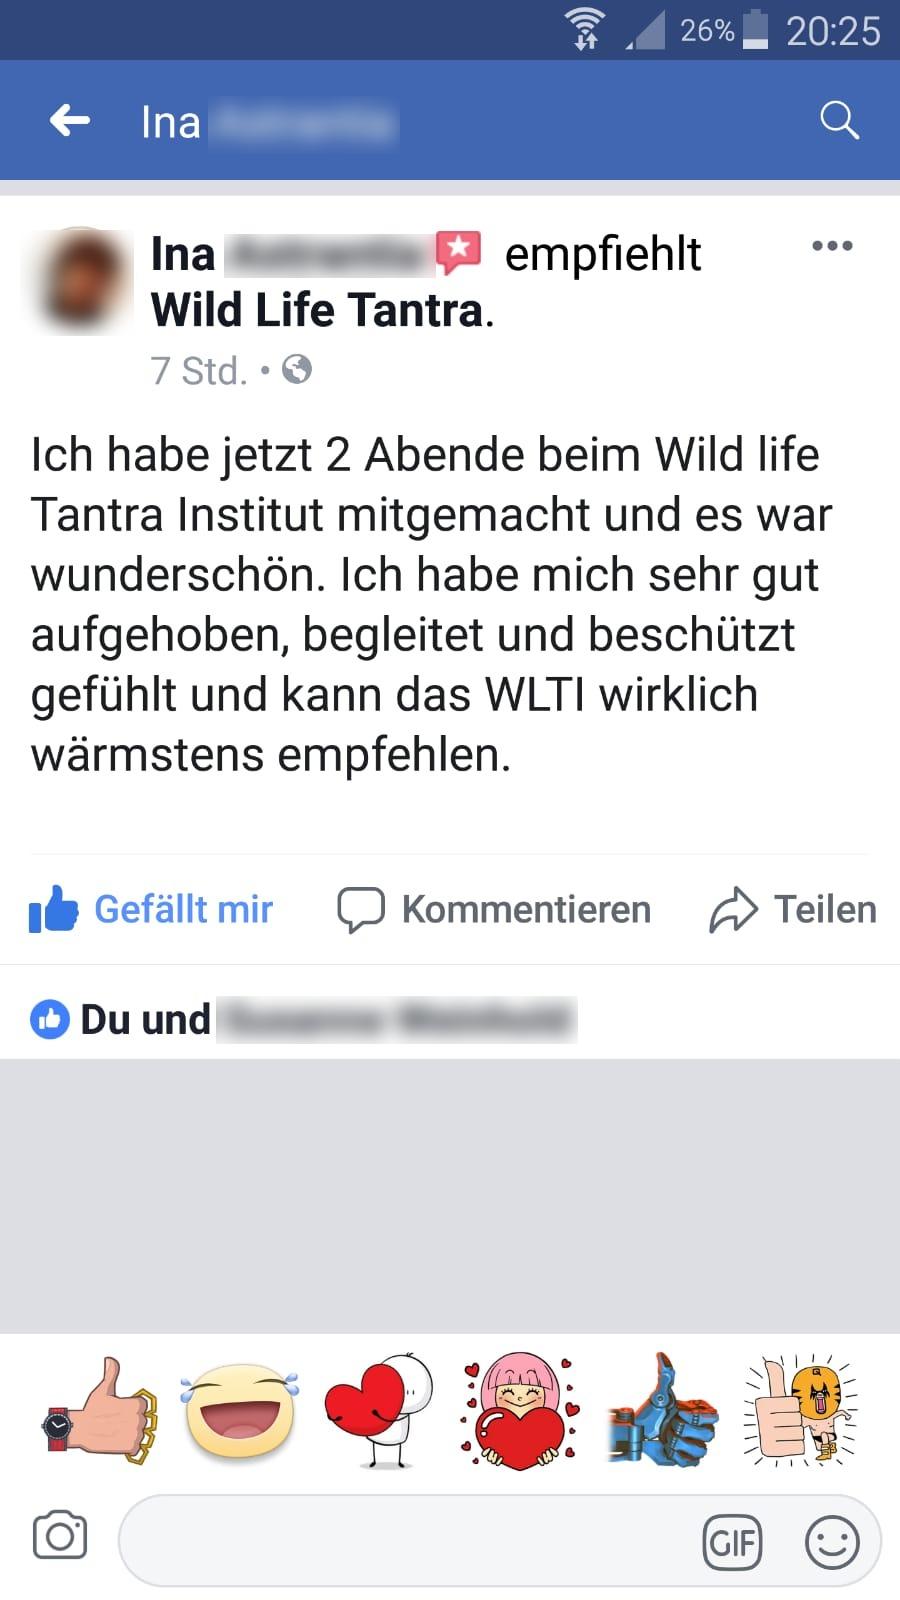 Testemonial Kundenmeinung Feedback Facebook Wild Life Touch Erlebnisabend Tantra Tantramassage Workshop Ritual Kreisritual